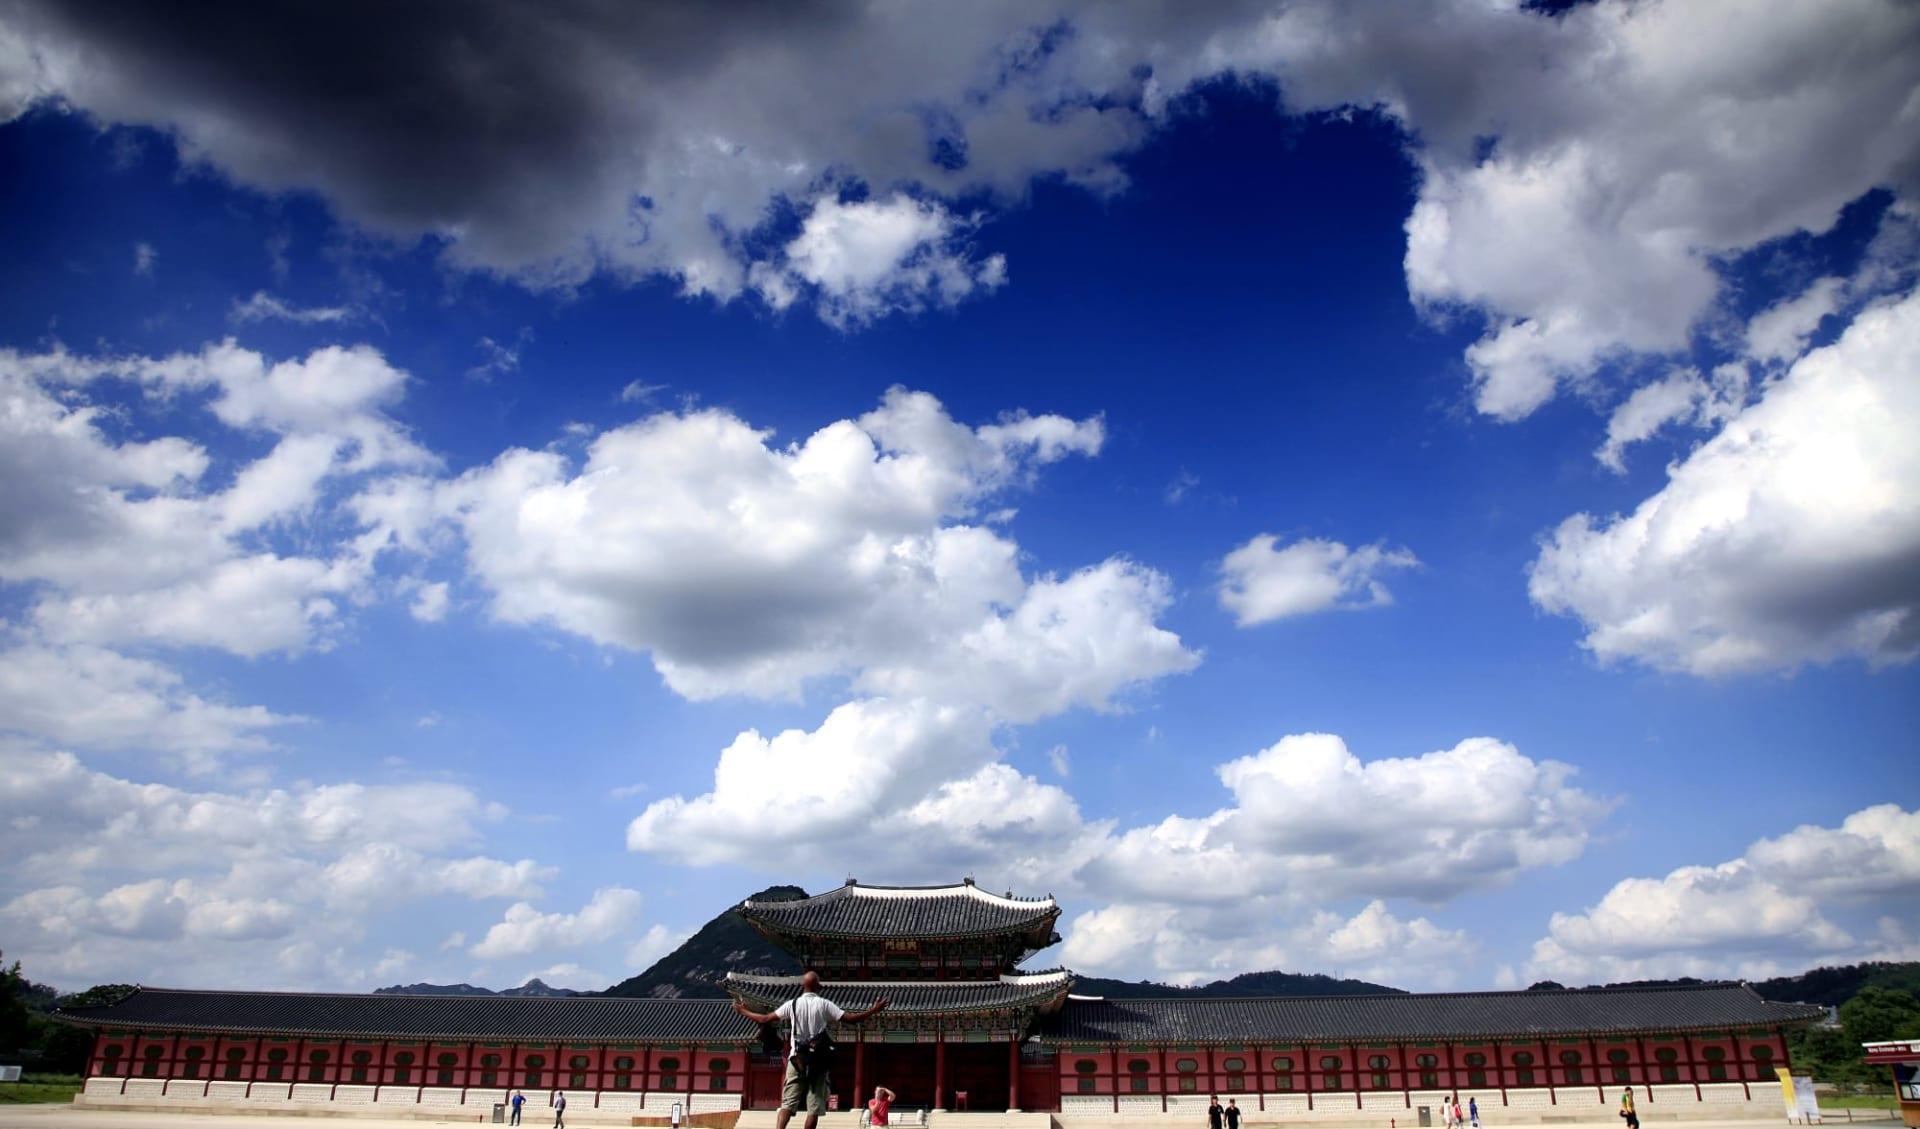 Gruppenreise «Südkorea - Land der Morgenstille» ab Seoul: Seoul Gyeongbok Palace